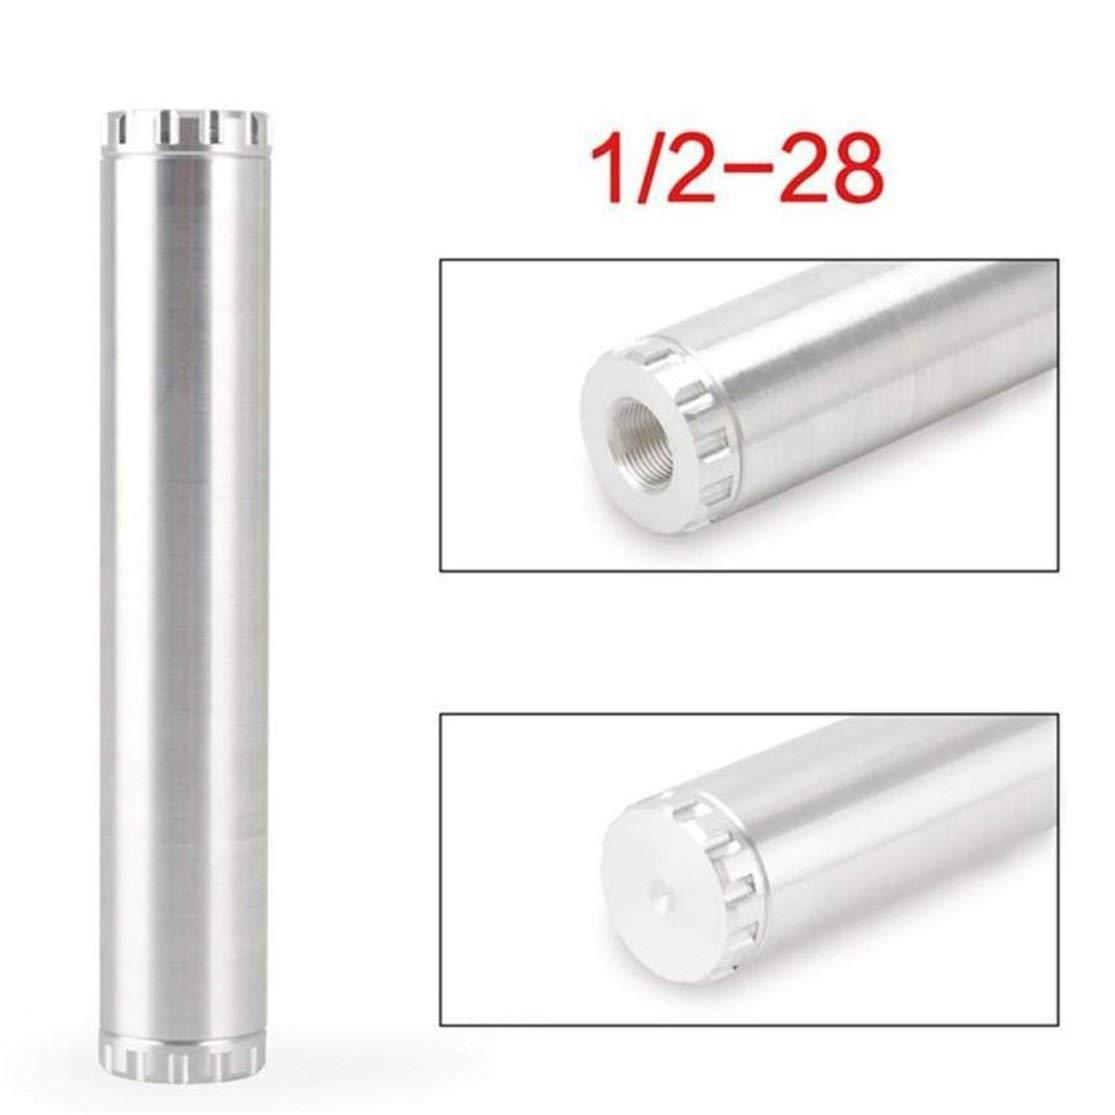 LouiseEvel215 Aleaci/ón de Aluminio 1//2-28 o 5//8-24 Trampa de Filtro de Combustible para autom/óvil//Filtro de solvente 1X7 o 1X13 Trampa de solvente para autom/óvil para NAPA 4003 WIX 24003